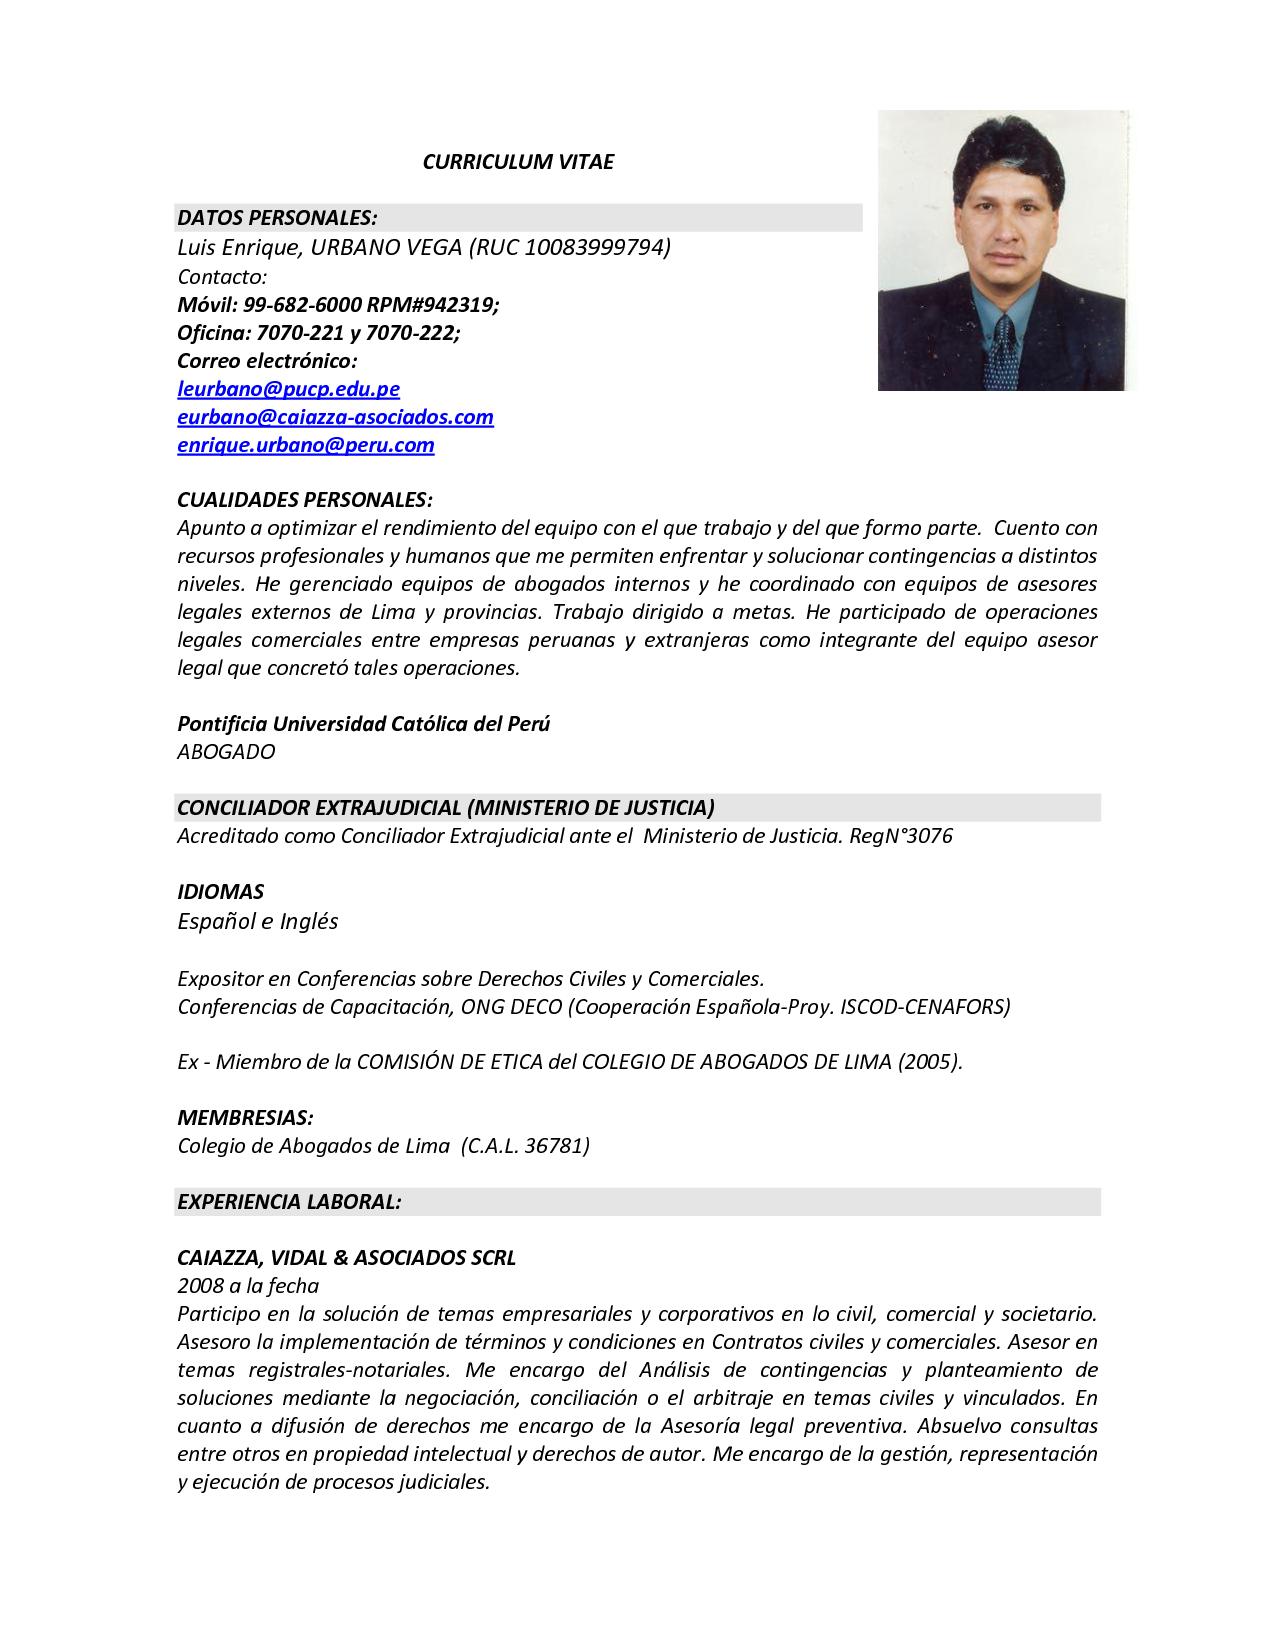 Taringa De Portugues Modelo Curriculum Vitae En Espanol Y Tattoo ...